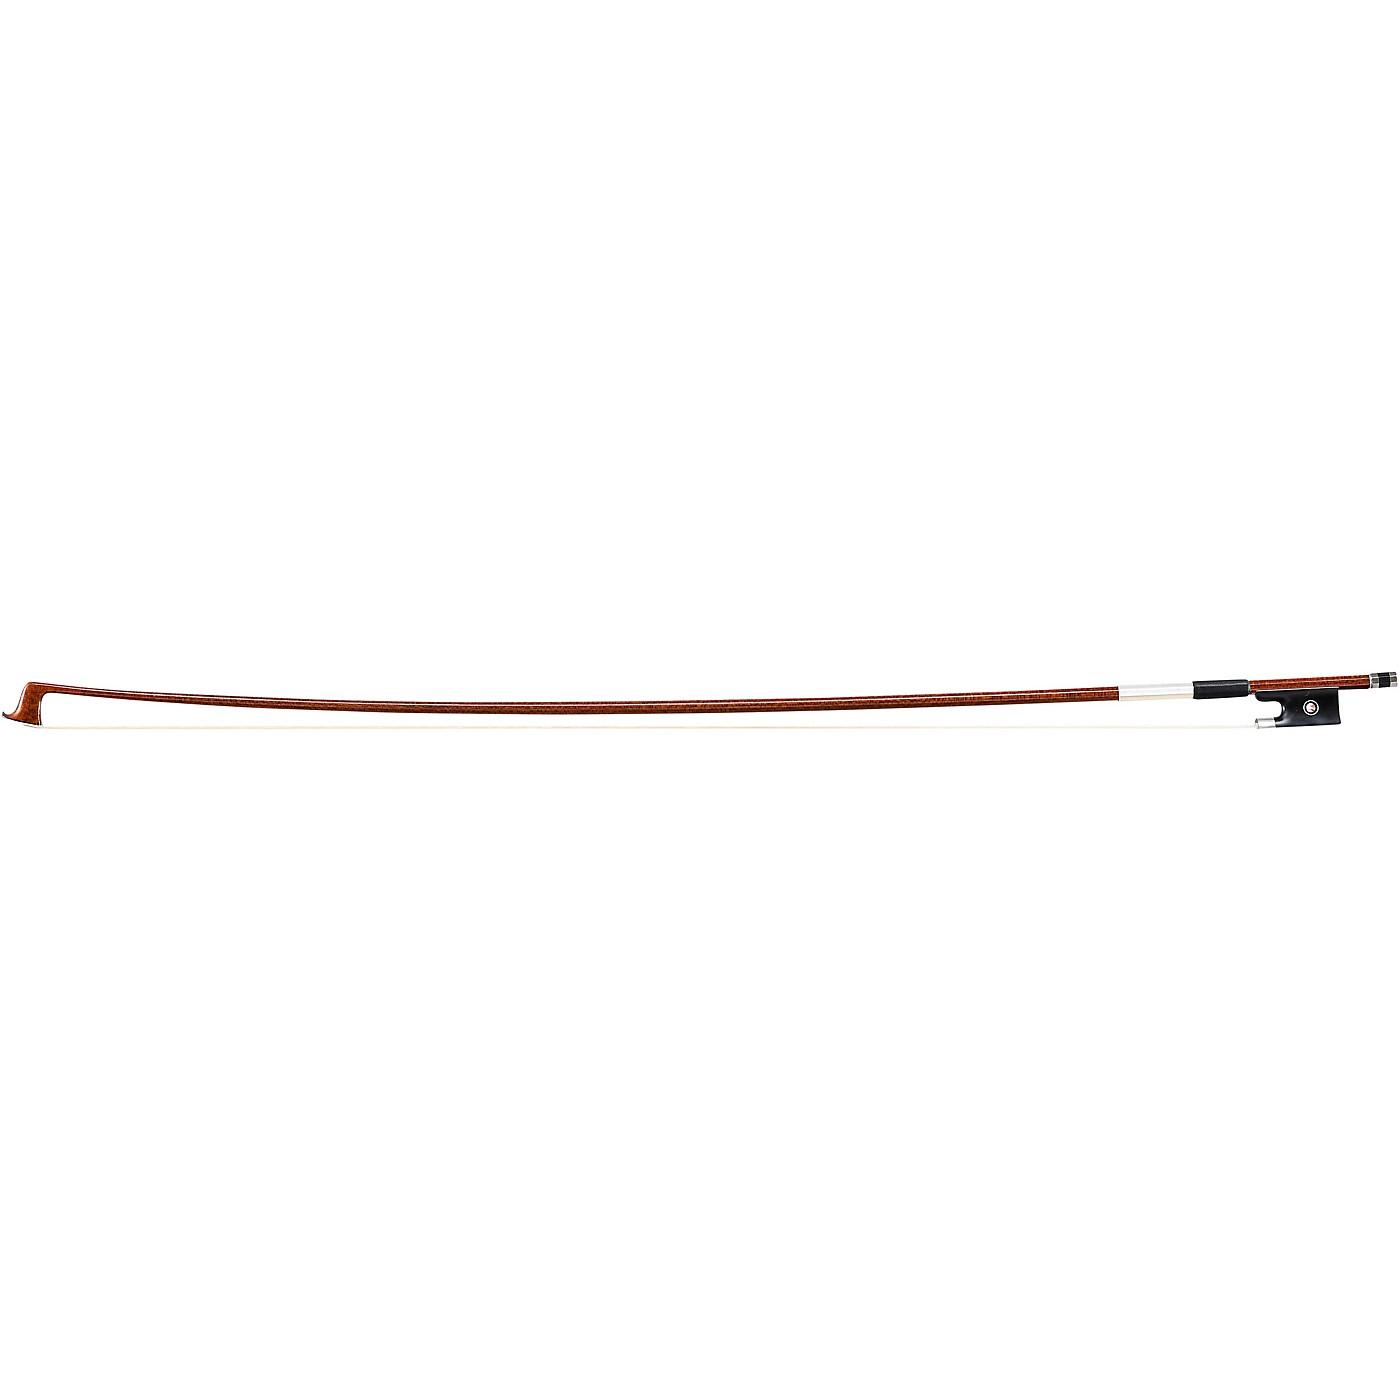 Artino Three Star Wood Veneer Carbon Fiber Violin Bow thumbnail